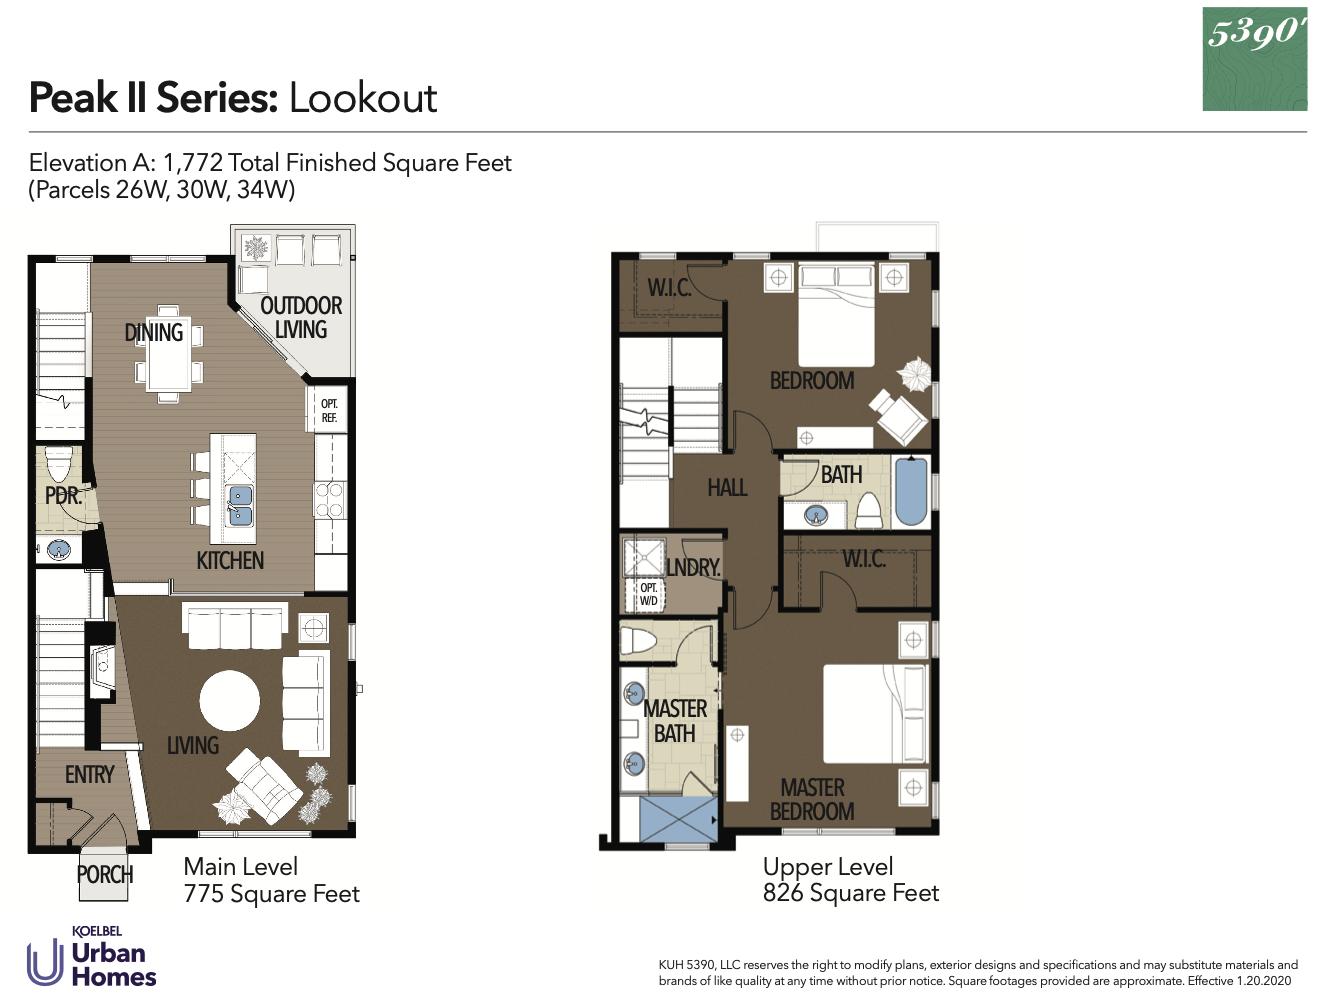 5390' Community by Koelbel in the Berkeley Tennyson Neighborhood Denver New Construction Homes For Sale Peak II Lookout Floorplan2